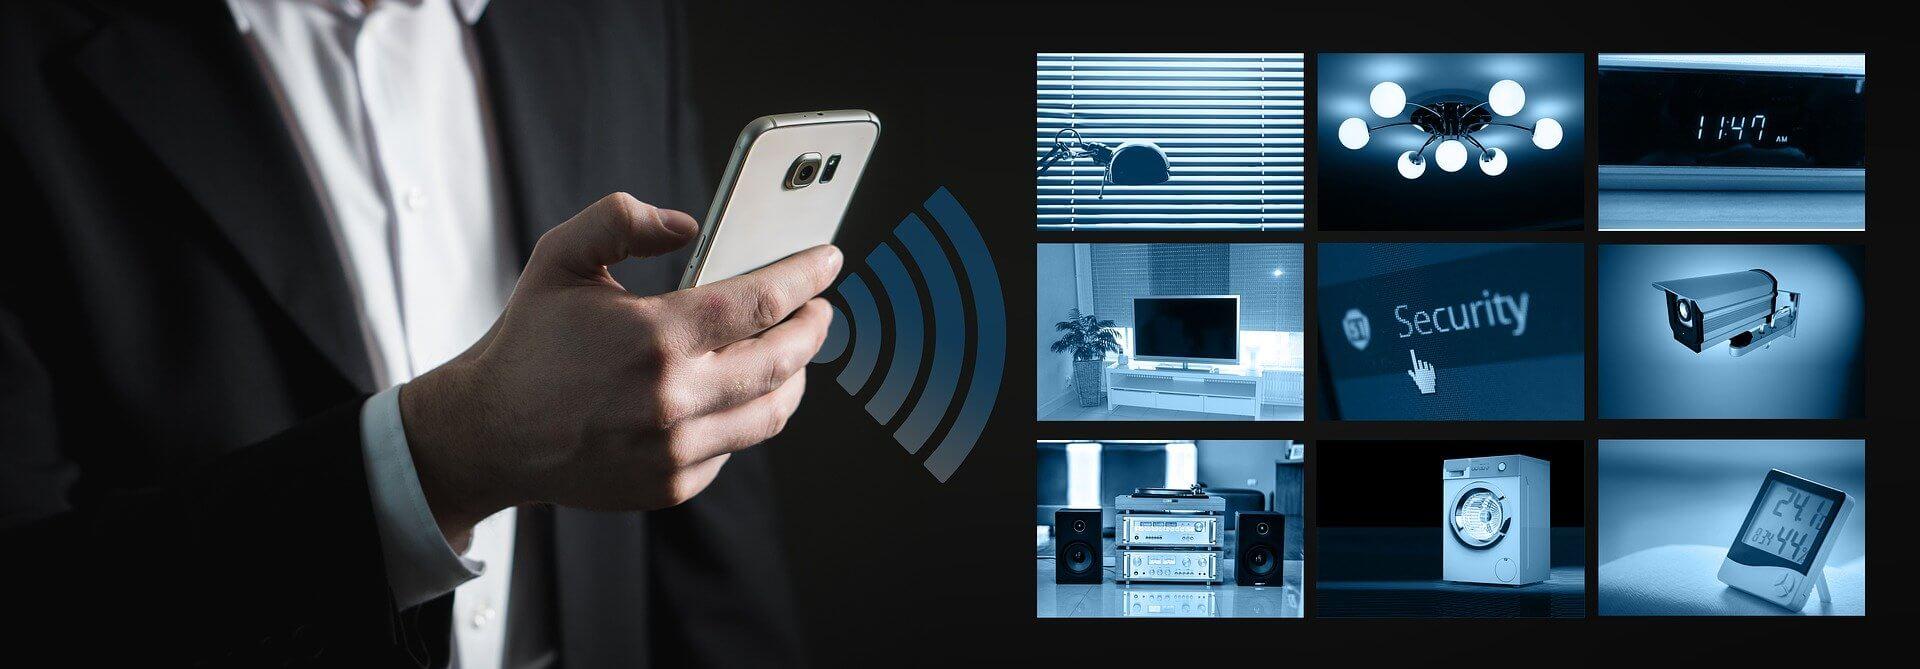 como proteger os dispositivos IoT de uma casa inteligente contra hackers